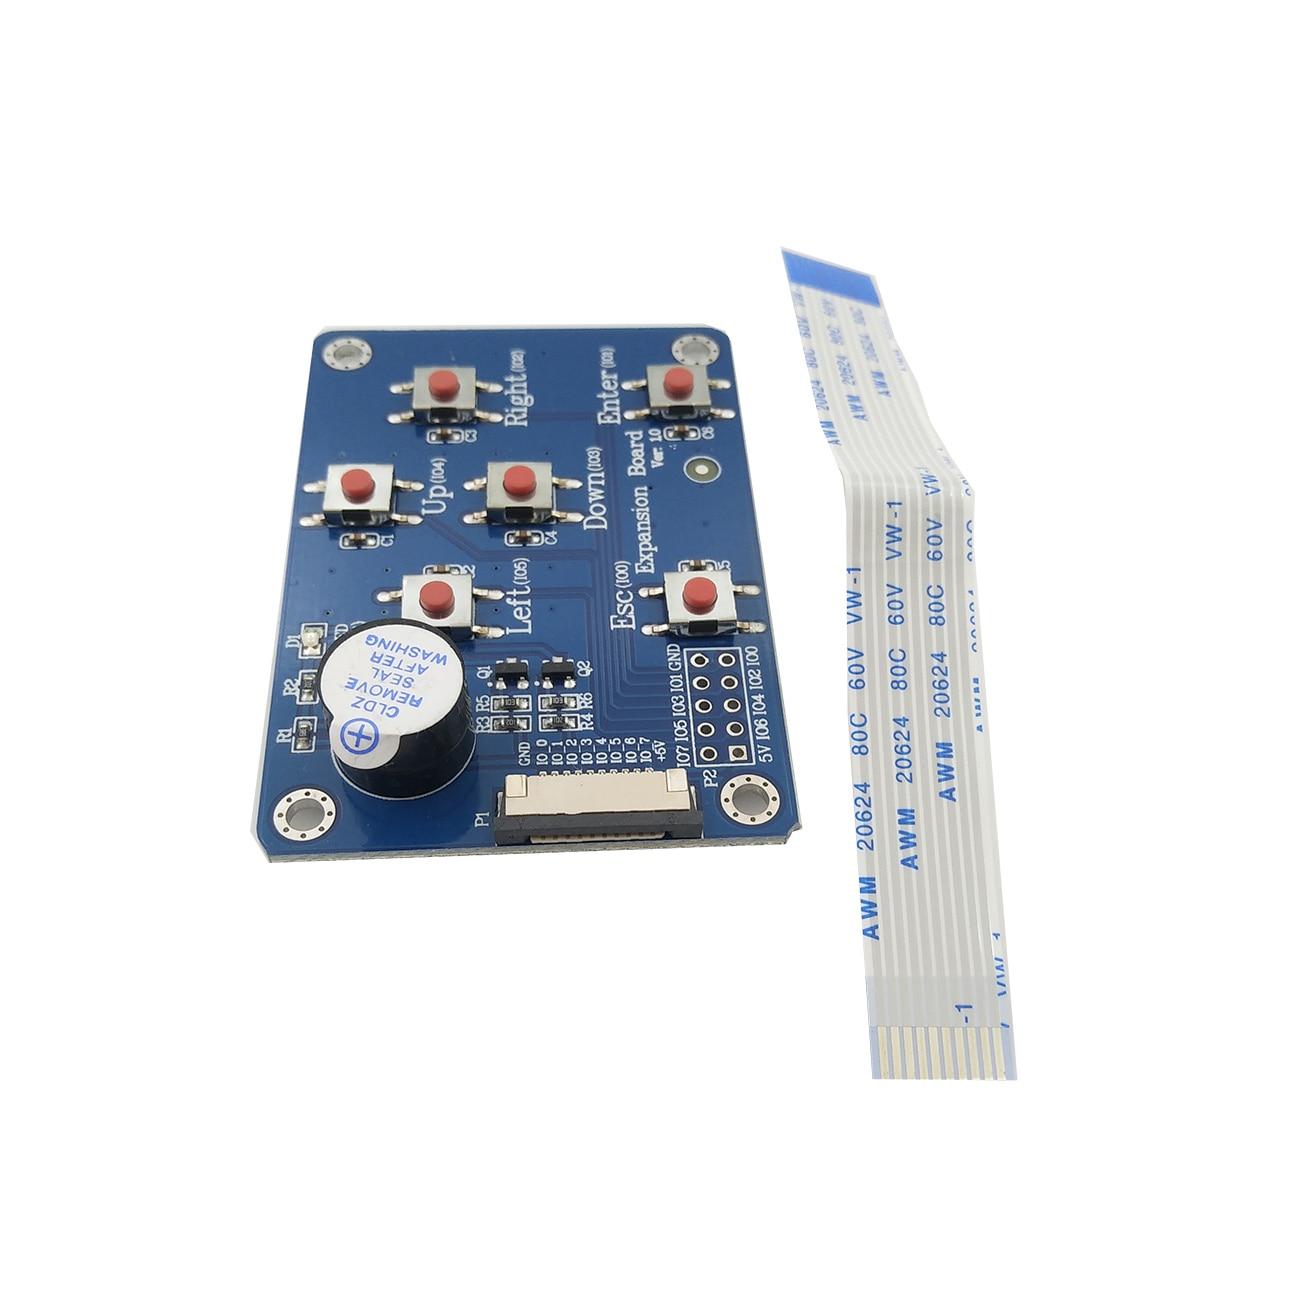 "Tablero para 2,4 "", 2,8"", 3,2 "", 3,5"", 4,3 "", 5,0"", 7,0 "","" Nextion mejorado HMI Módulo de visualización inteligente LCD I/O extendido"